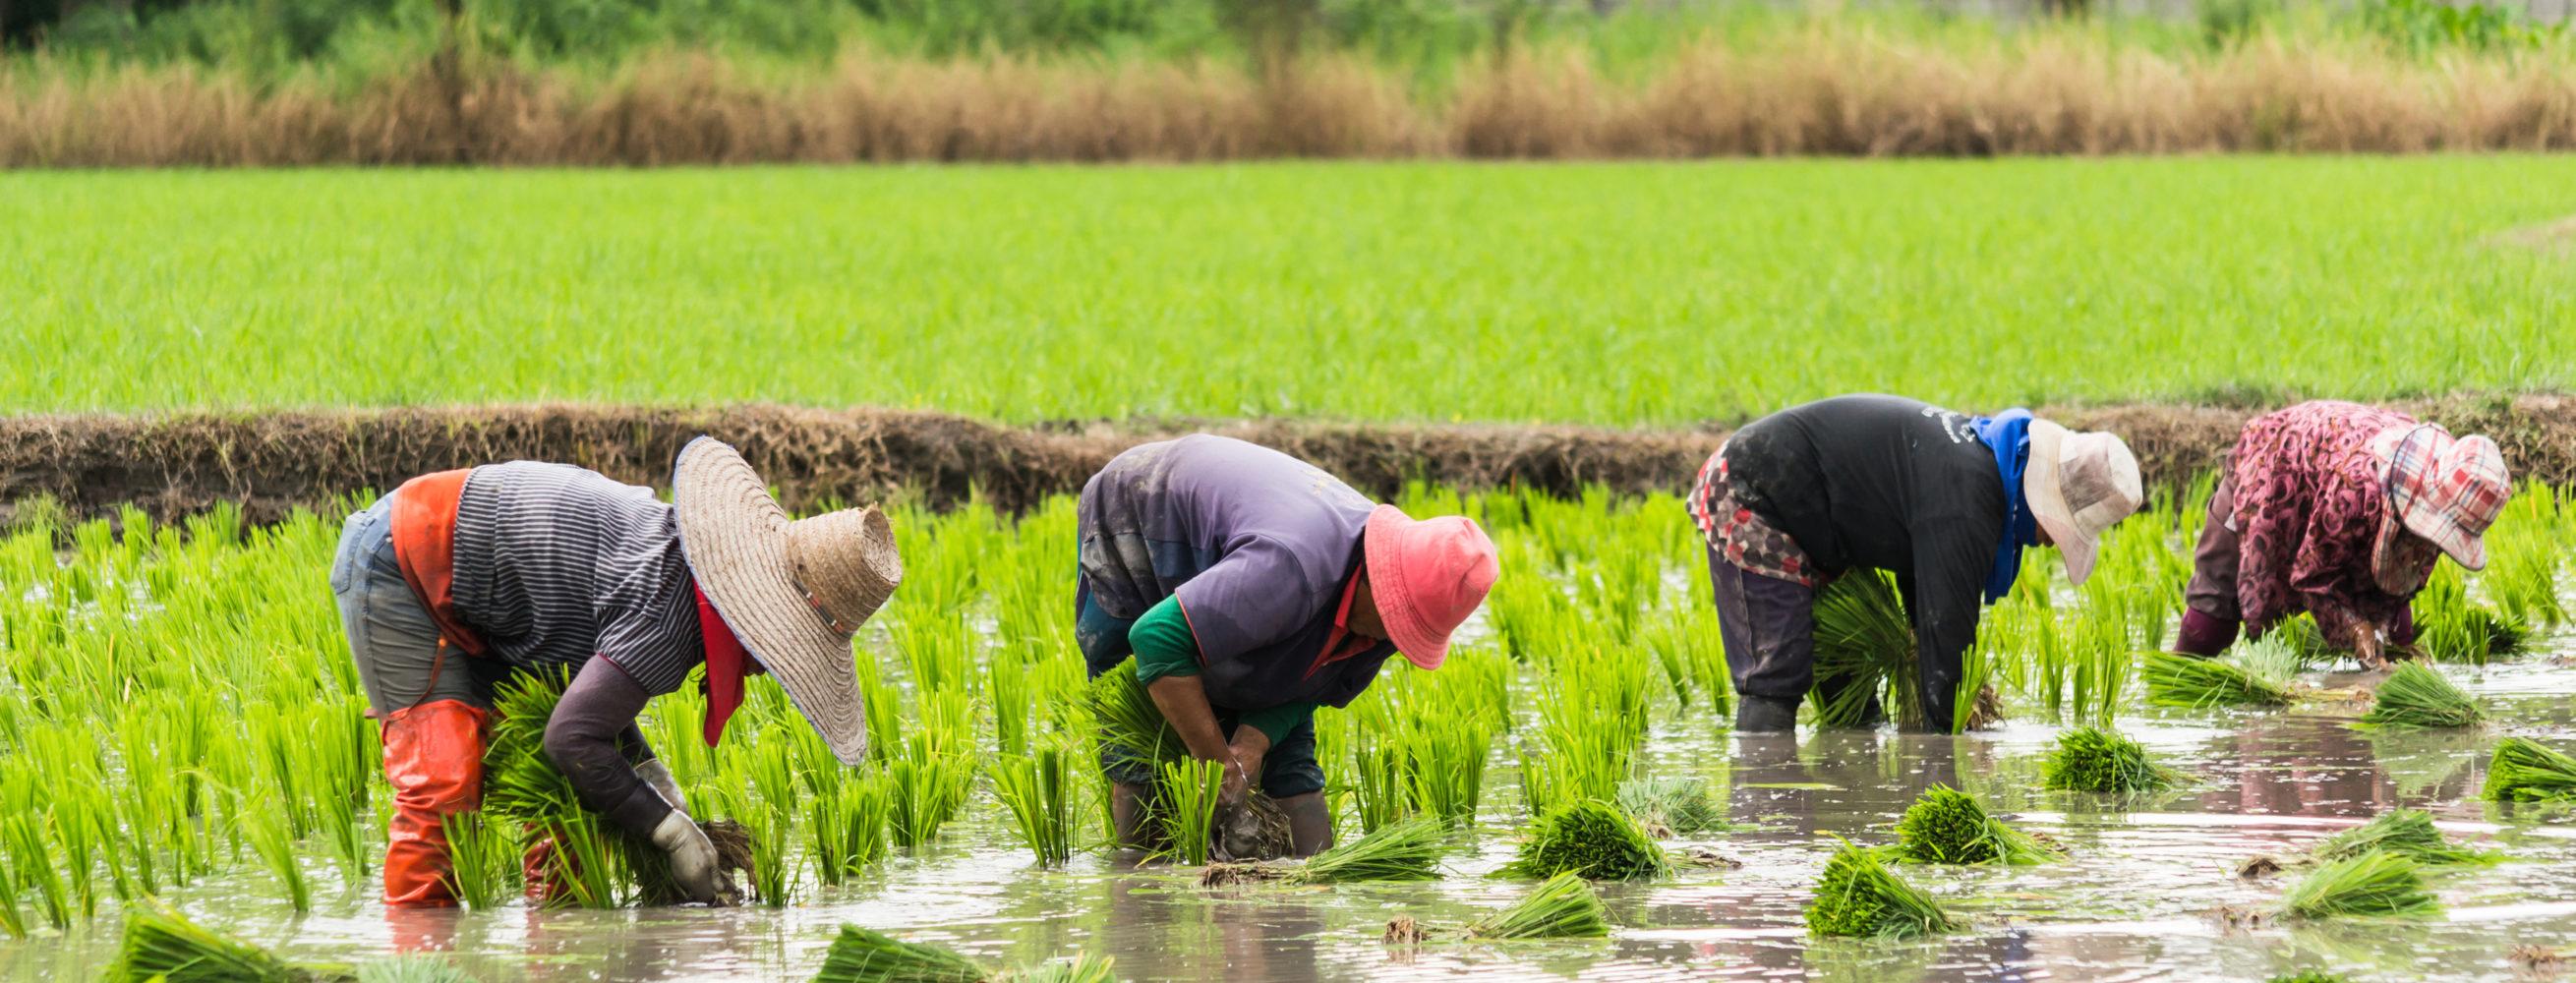 Vietnam Landarbeiter bei der Reispflanzung © 123RF.com